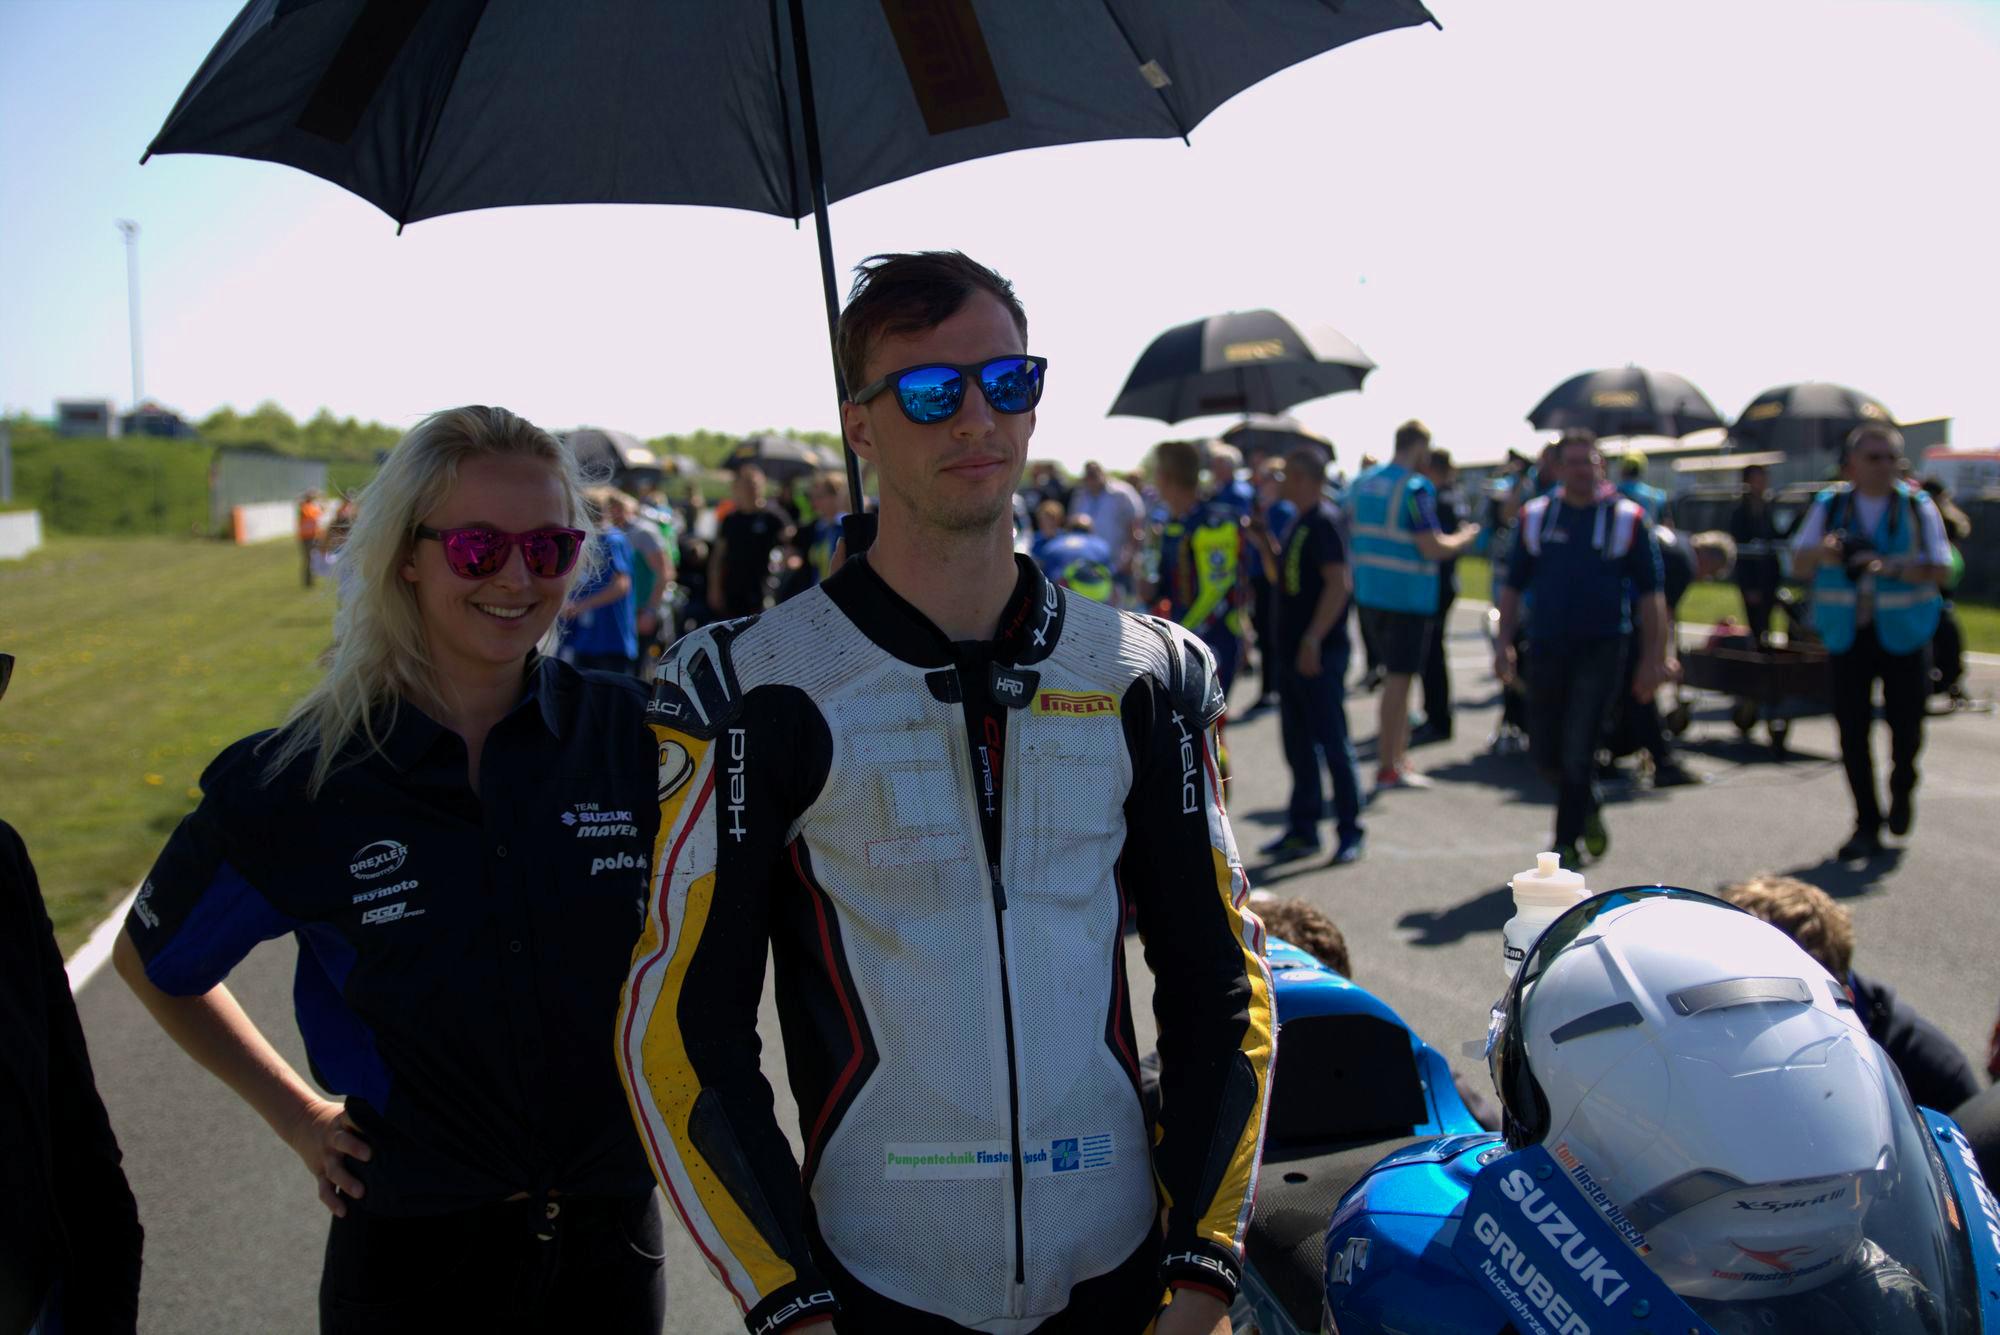 IDM 2018 Motorsportarena Oschersleben - Toni Finsterbusch - Team Suzuki Mayer